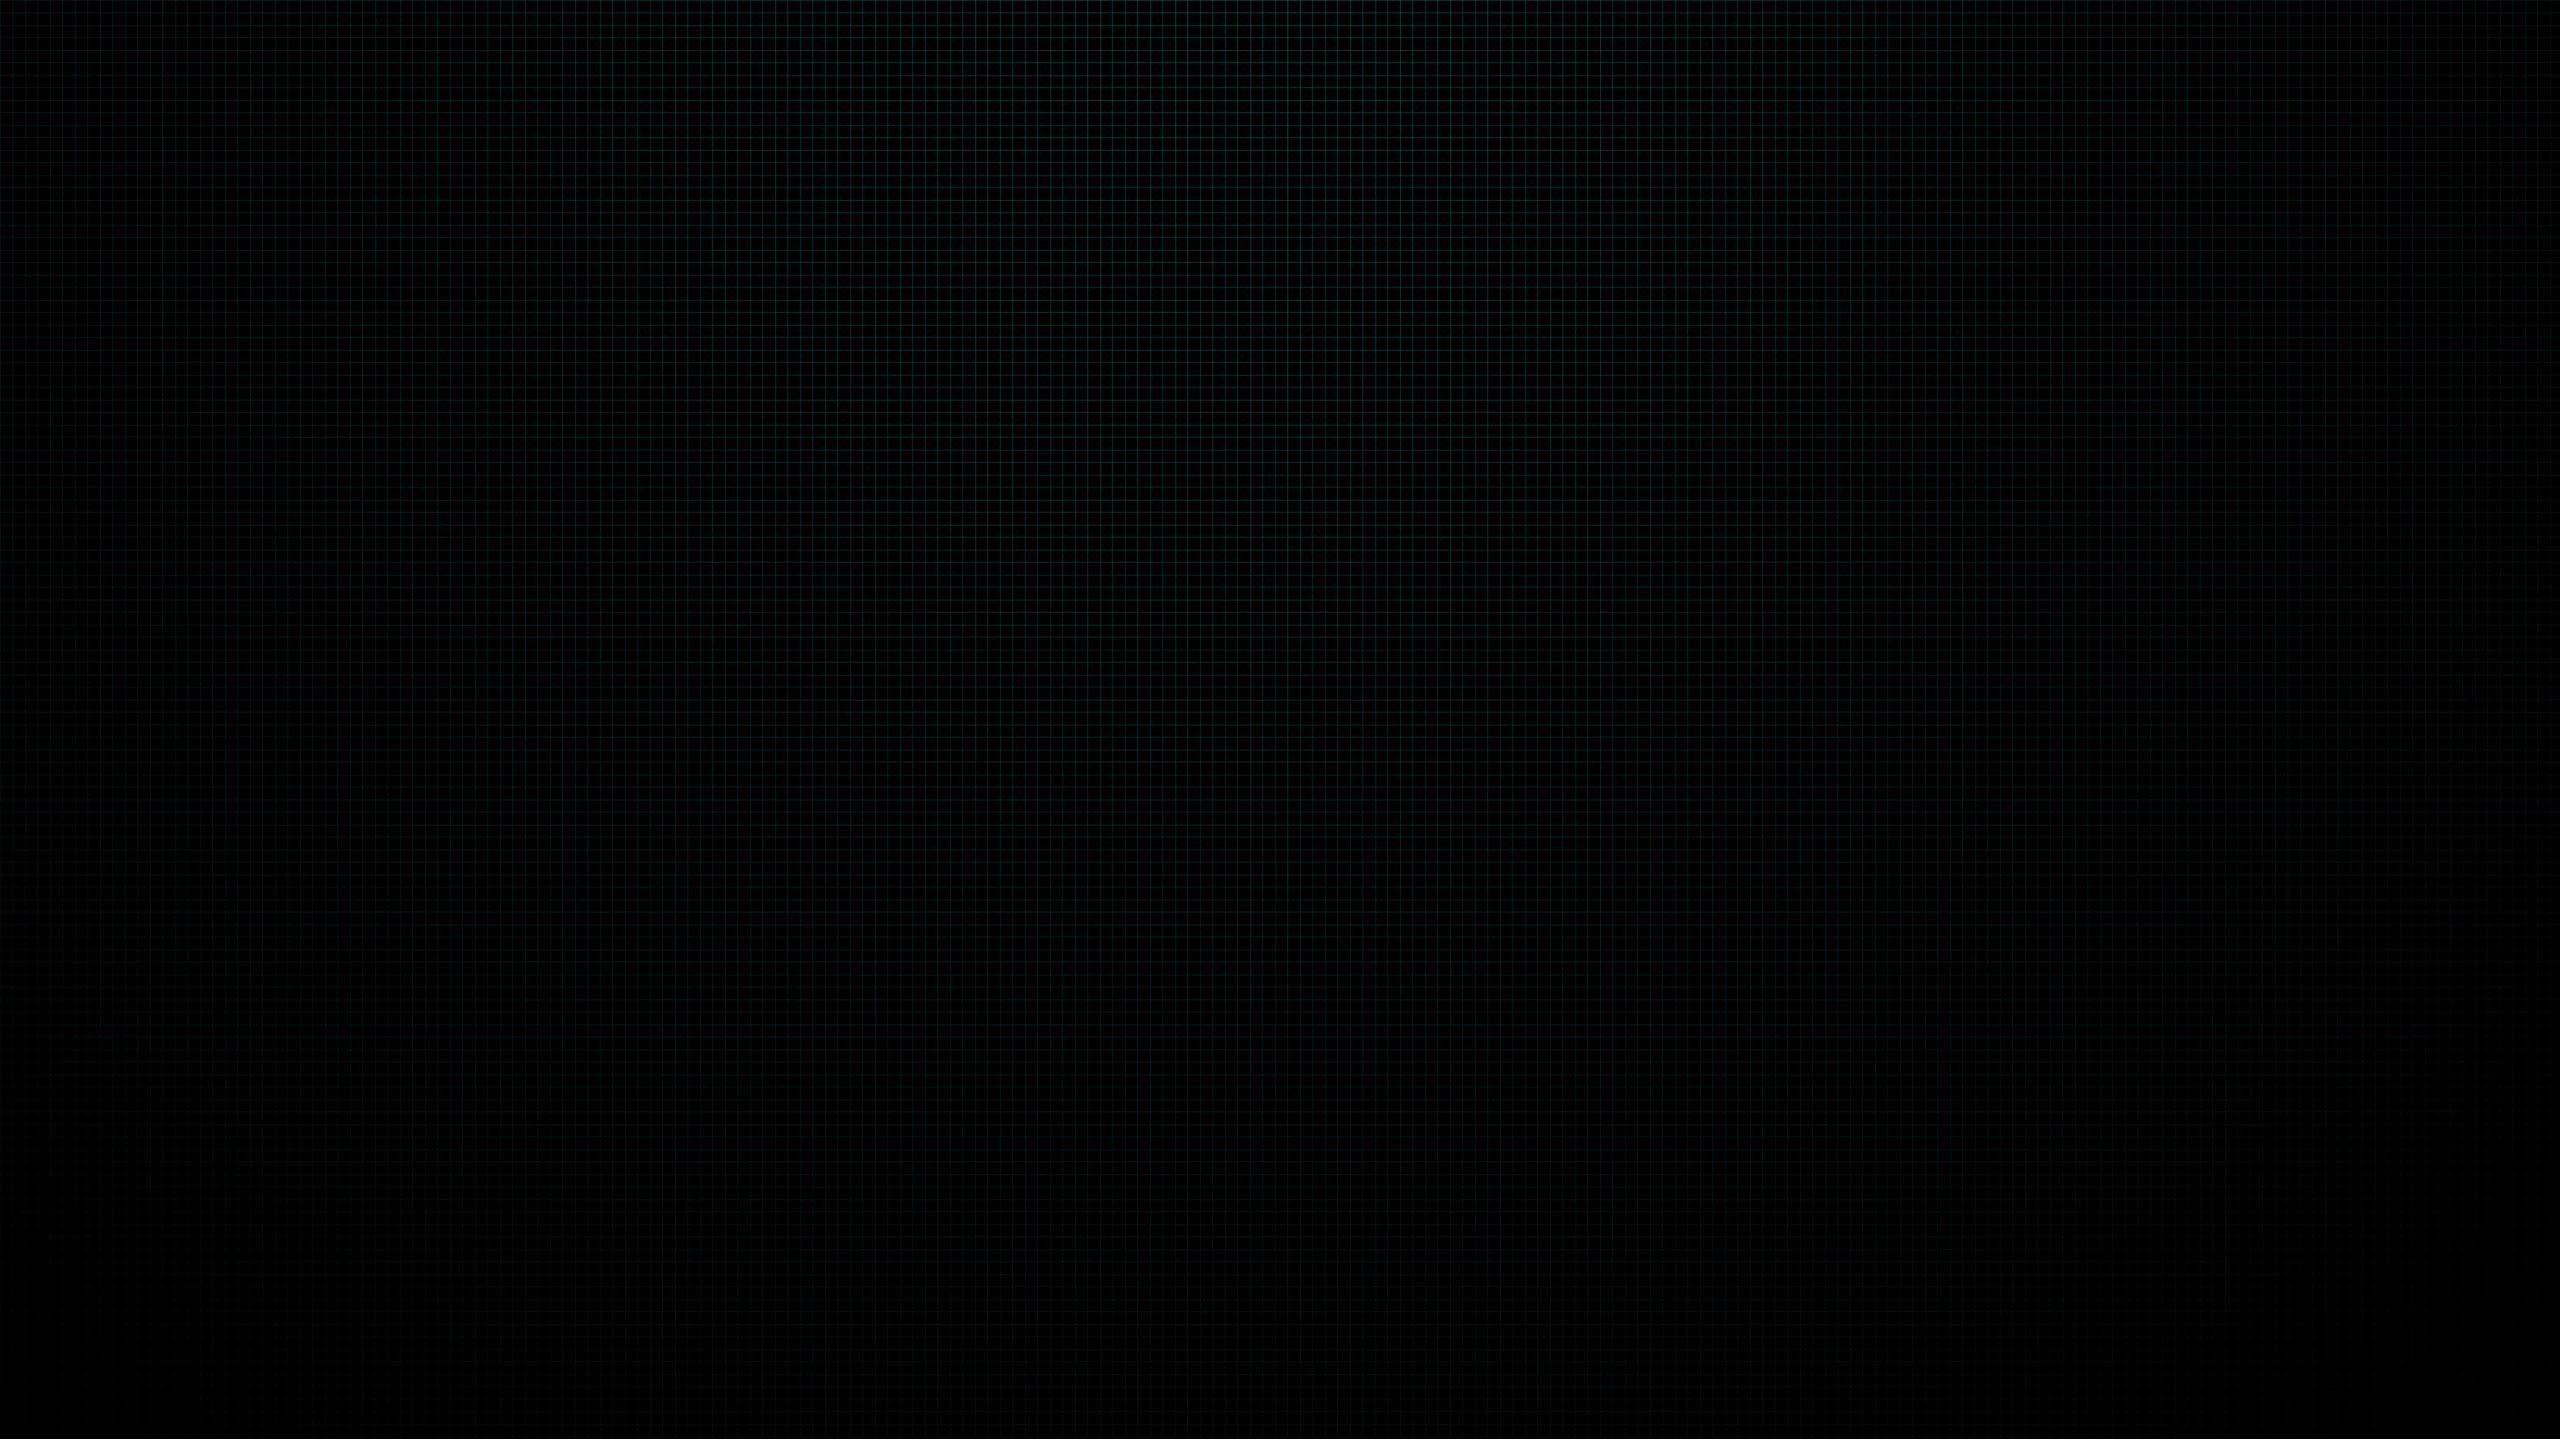 4K Black Wallpapers - Top Free 4K Black ...